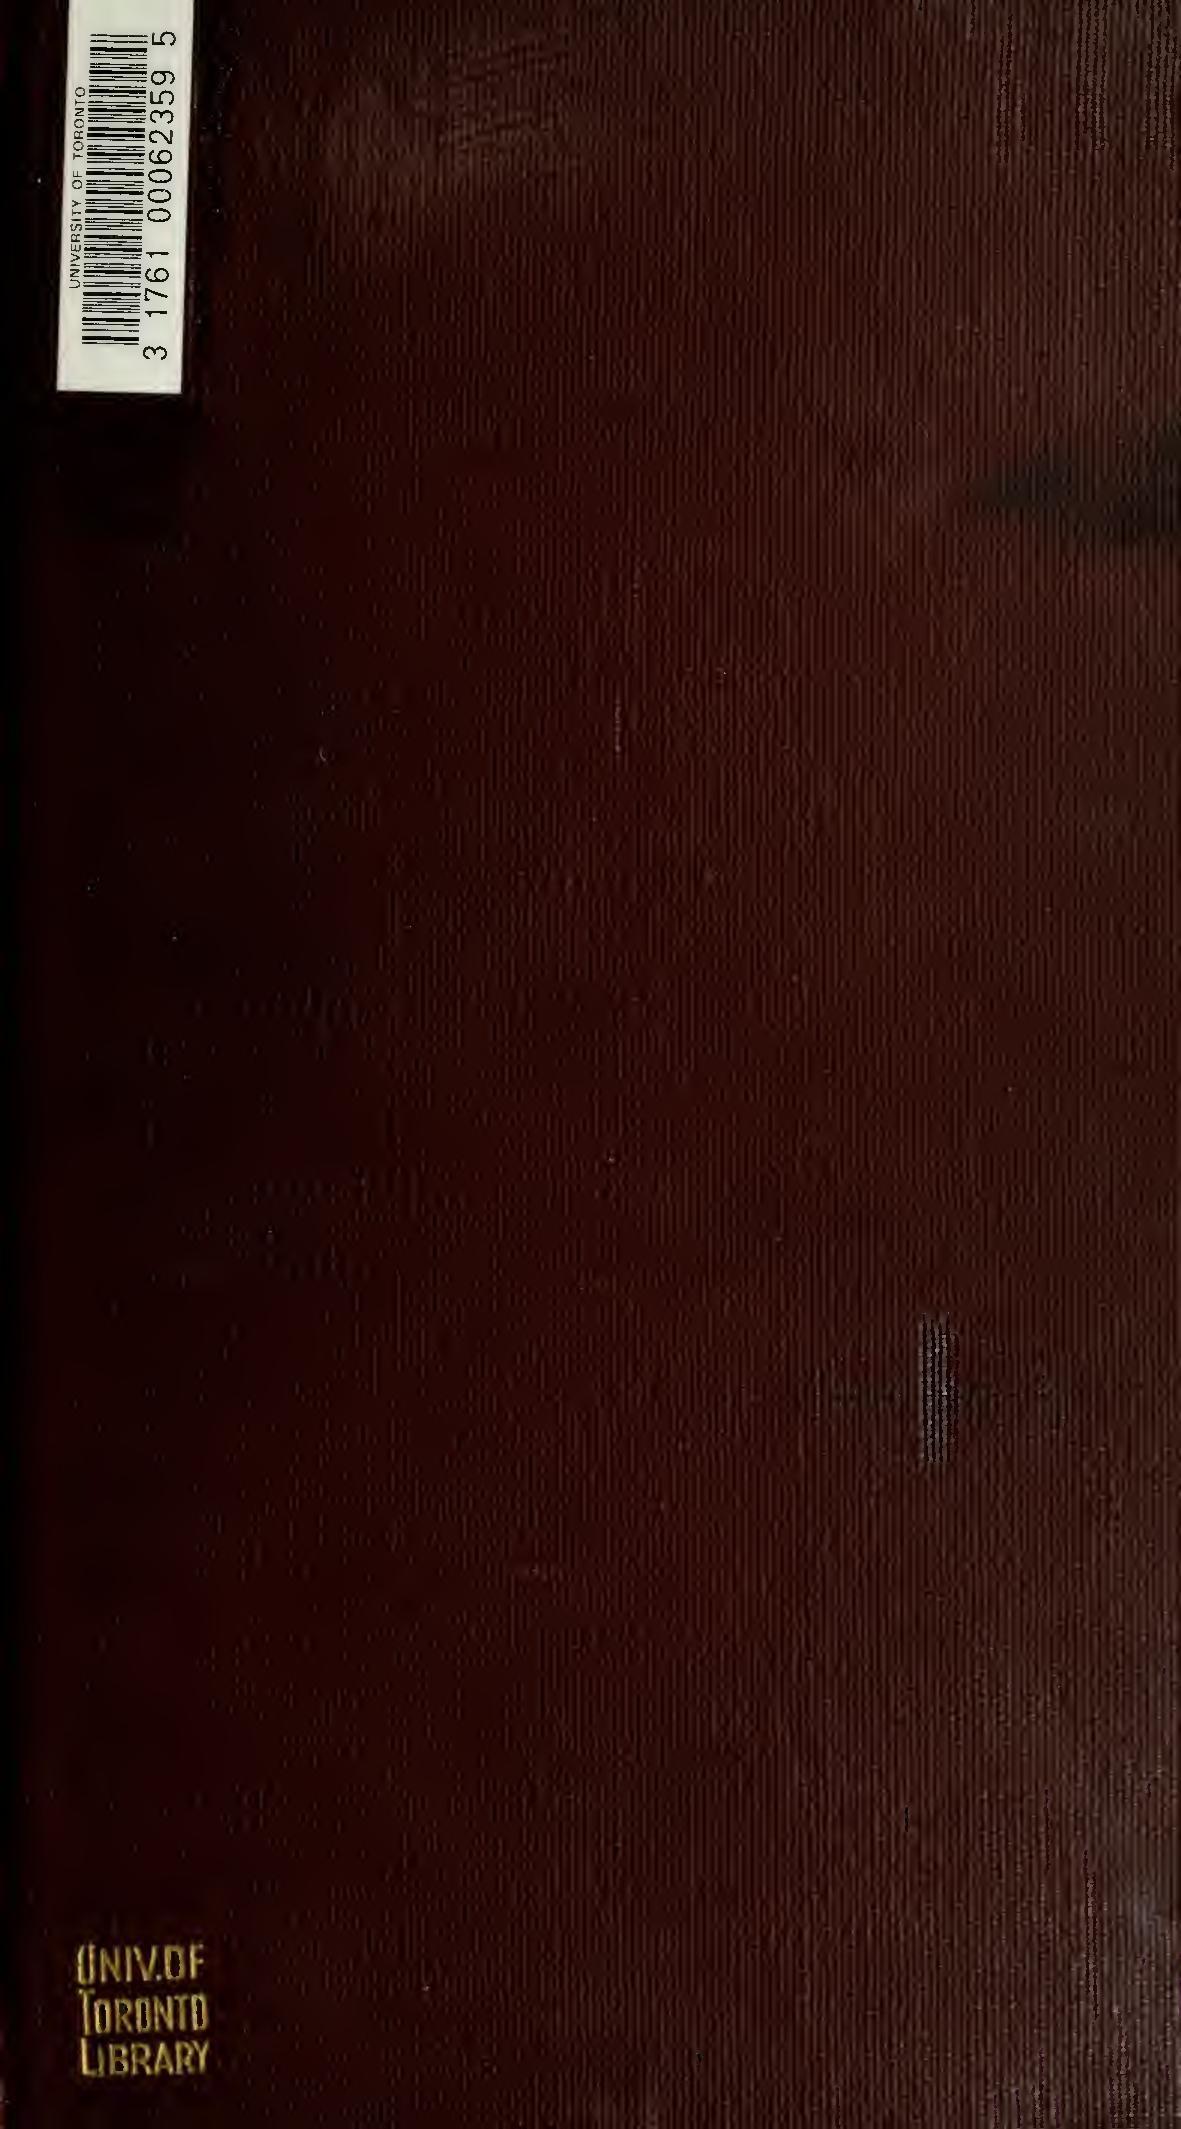 Fileencyclopedia Of Religion And Ethics Volume 1pdf Wikimedia Original File Svg Nominally 573 X 444 Pixels Size 2129